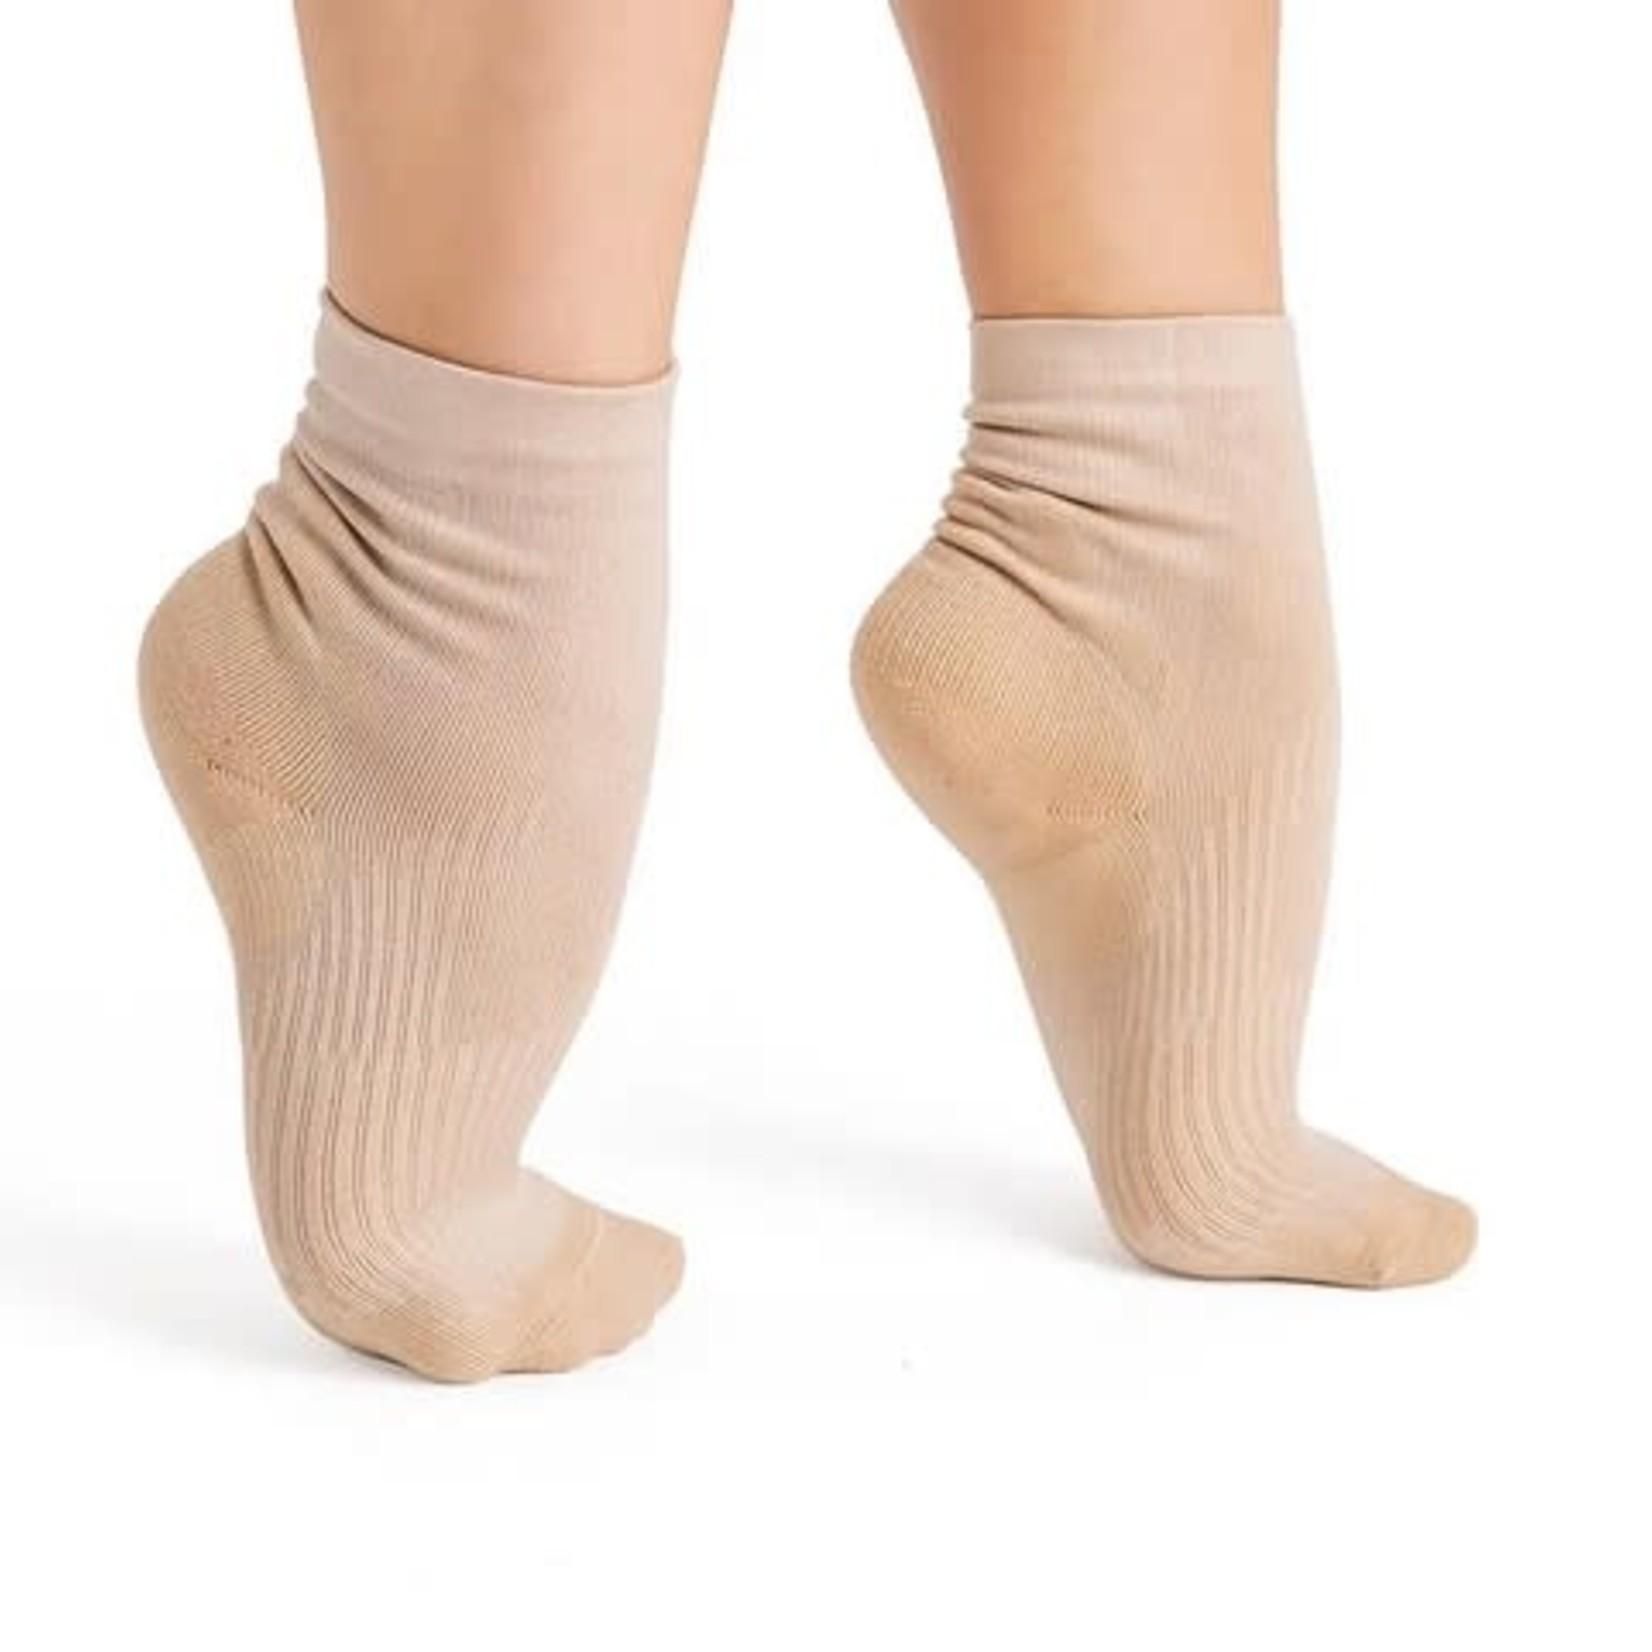 Capezio Capezio H066 Lifeknit Sox Dance Socks